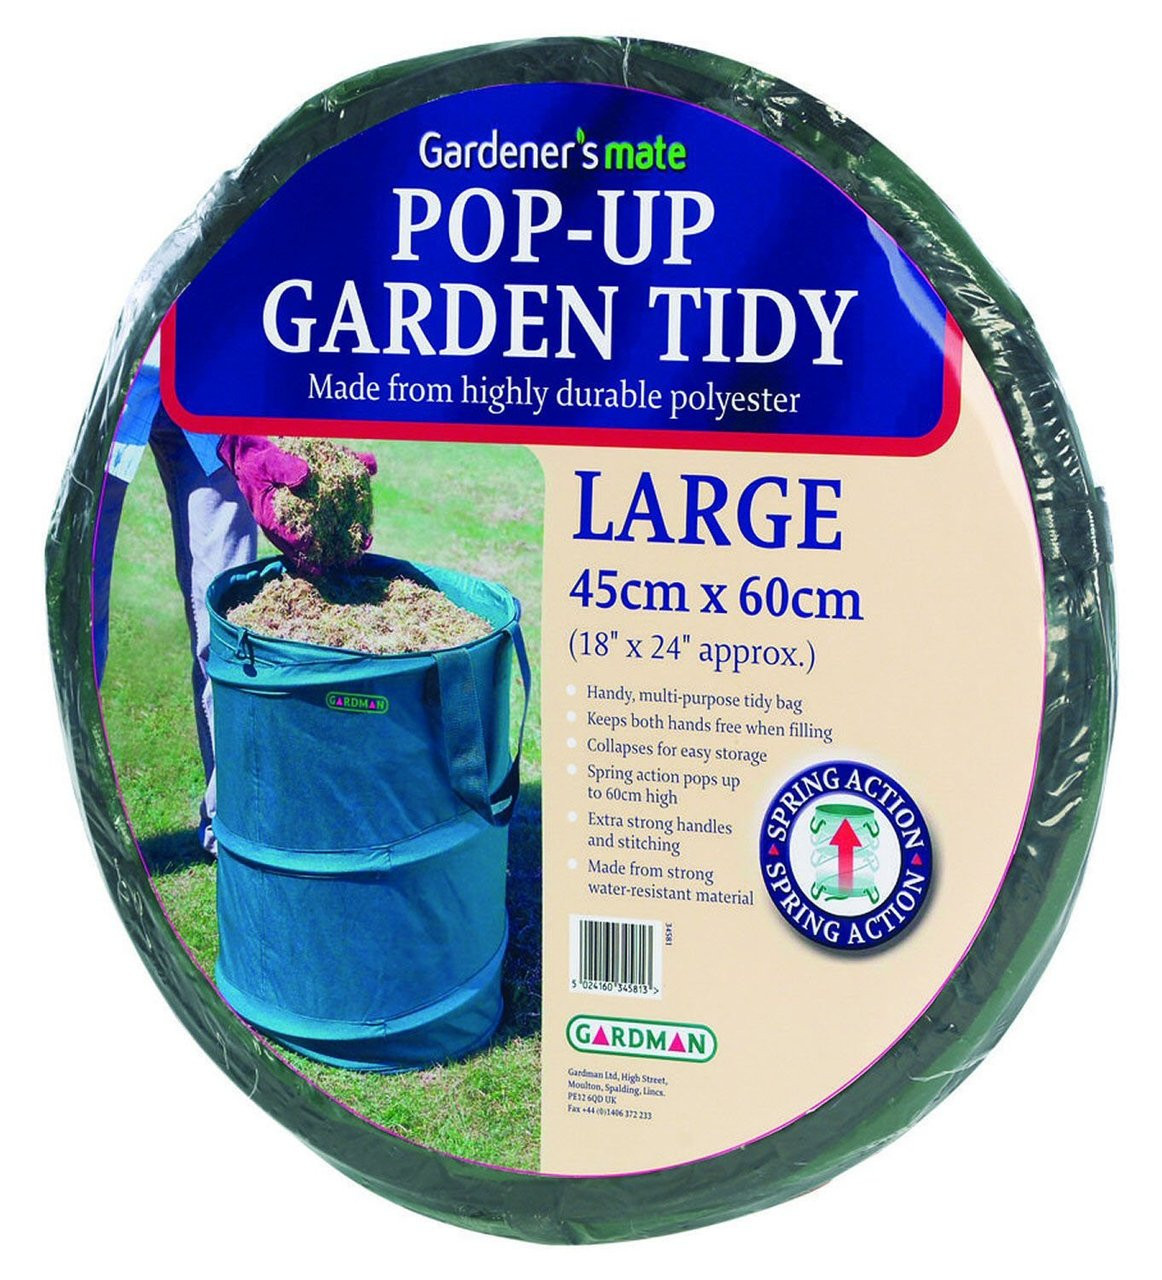 Gardener's-mate-Pop-up-Garden-Tidy-Large